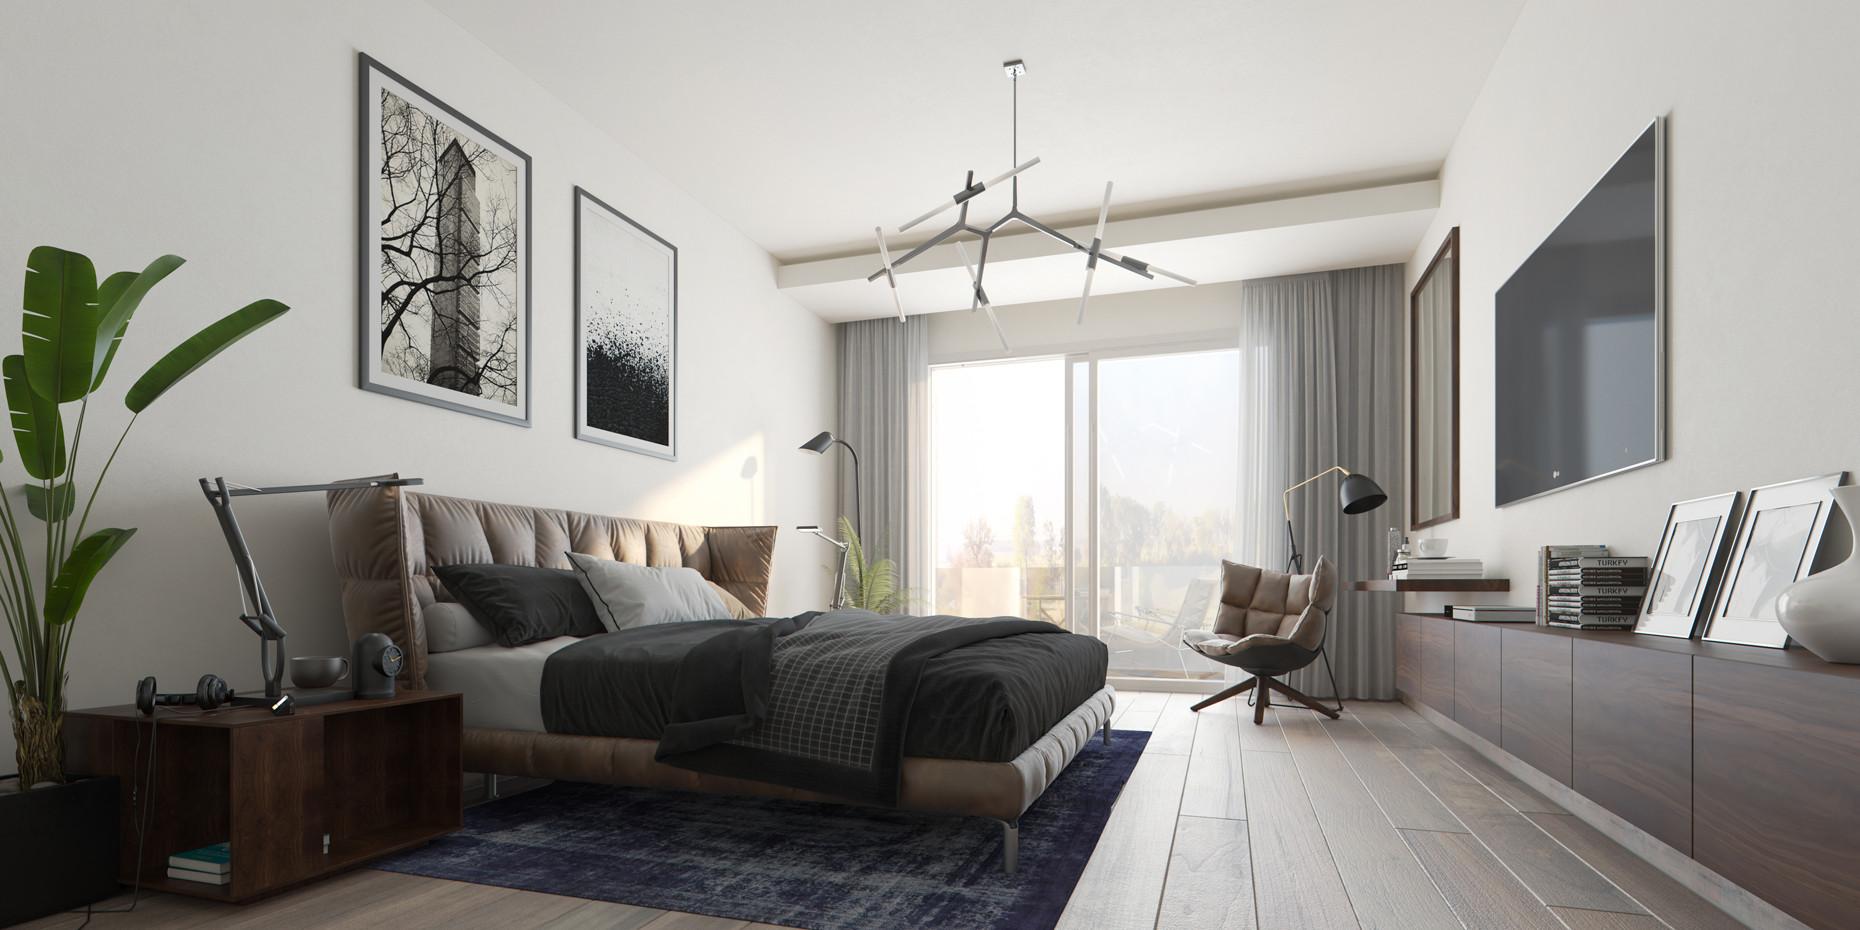 Bedroom-Final-Final-edit-1.jpg